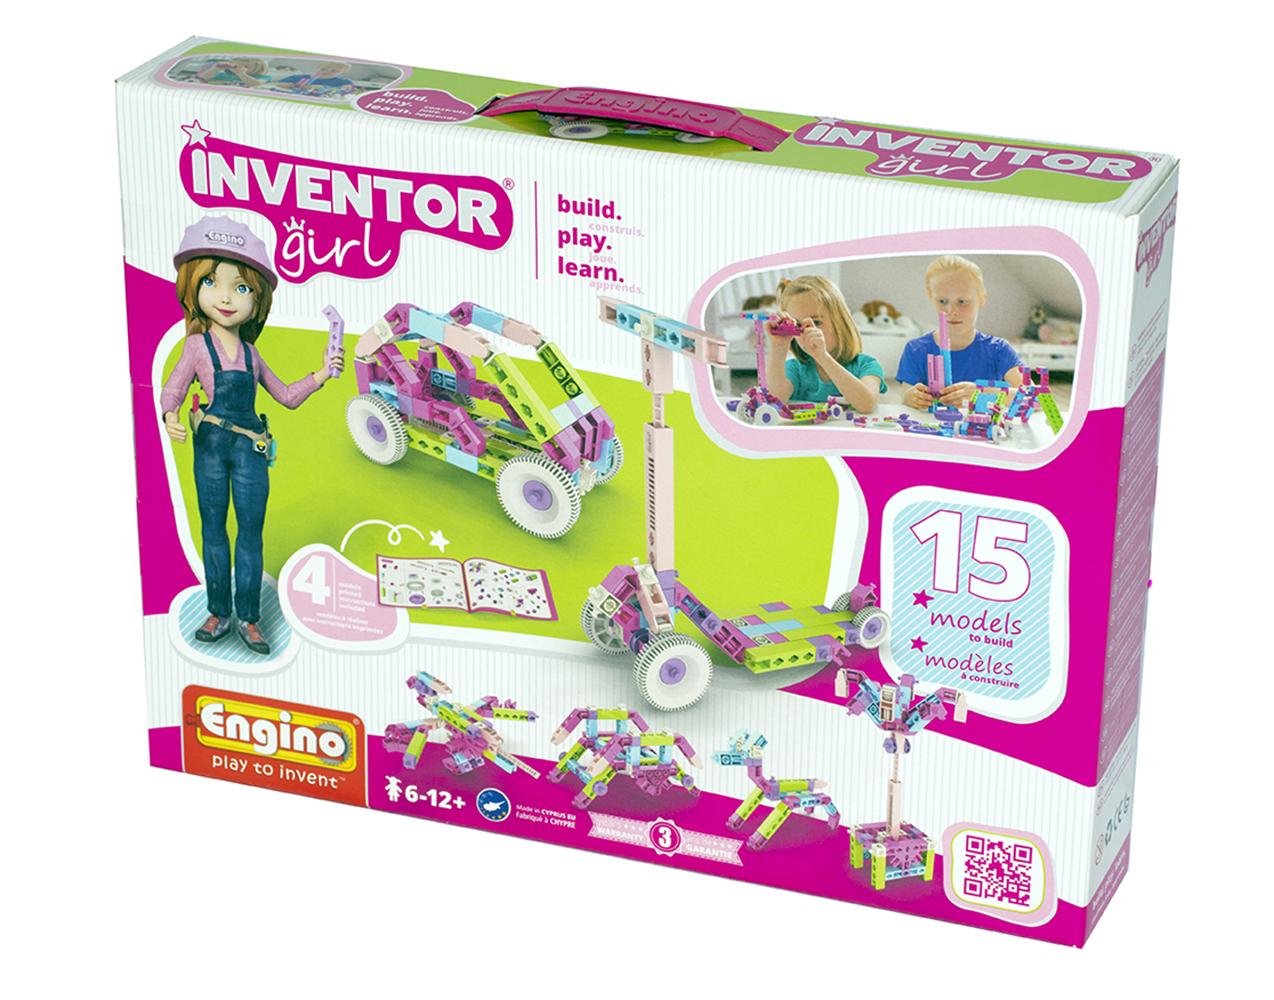 Inventor Girls 15 Modèles